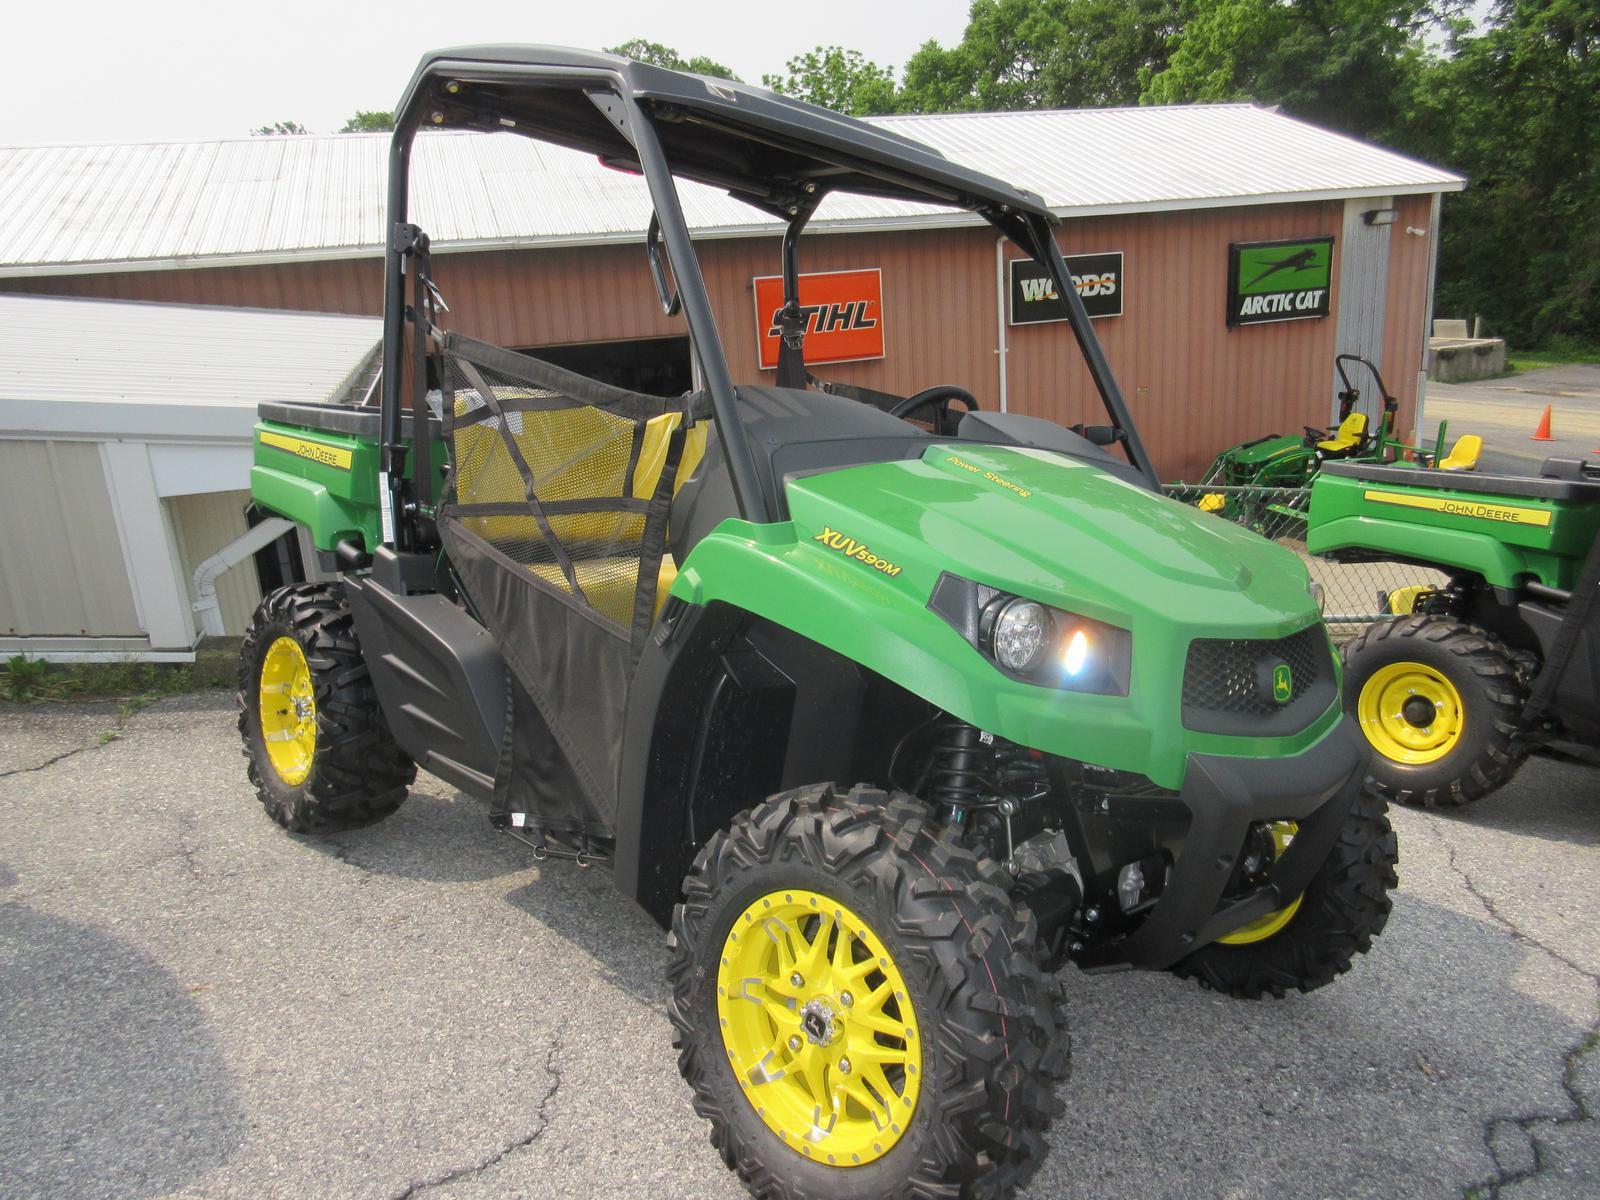 Inventory from John Deere Hilltop Sales & Service Bangor, PA